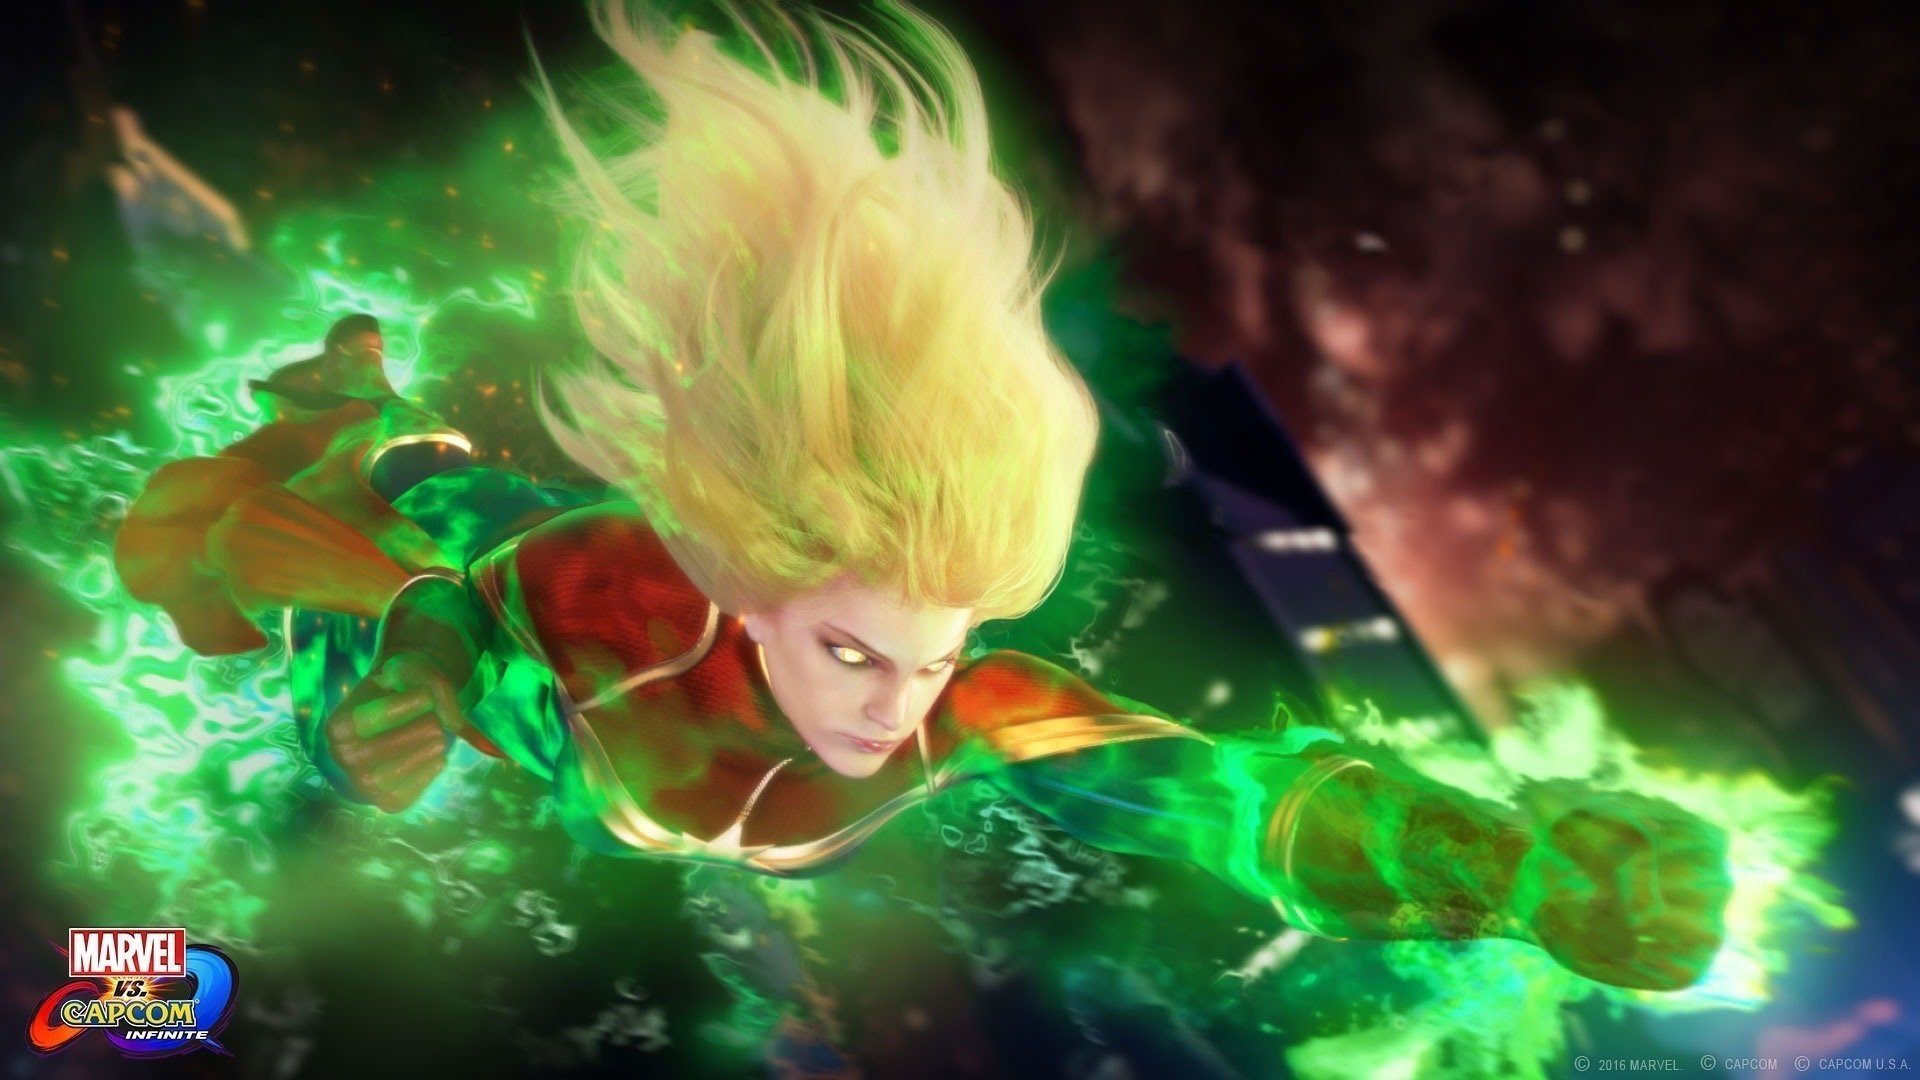 Marvel Vs Capcom Infinite Hd Wallpaper Background Image